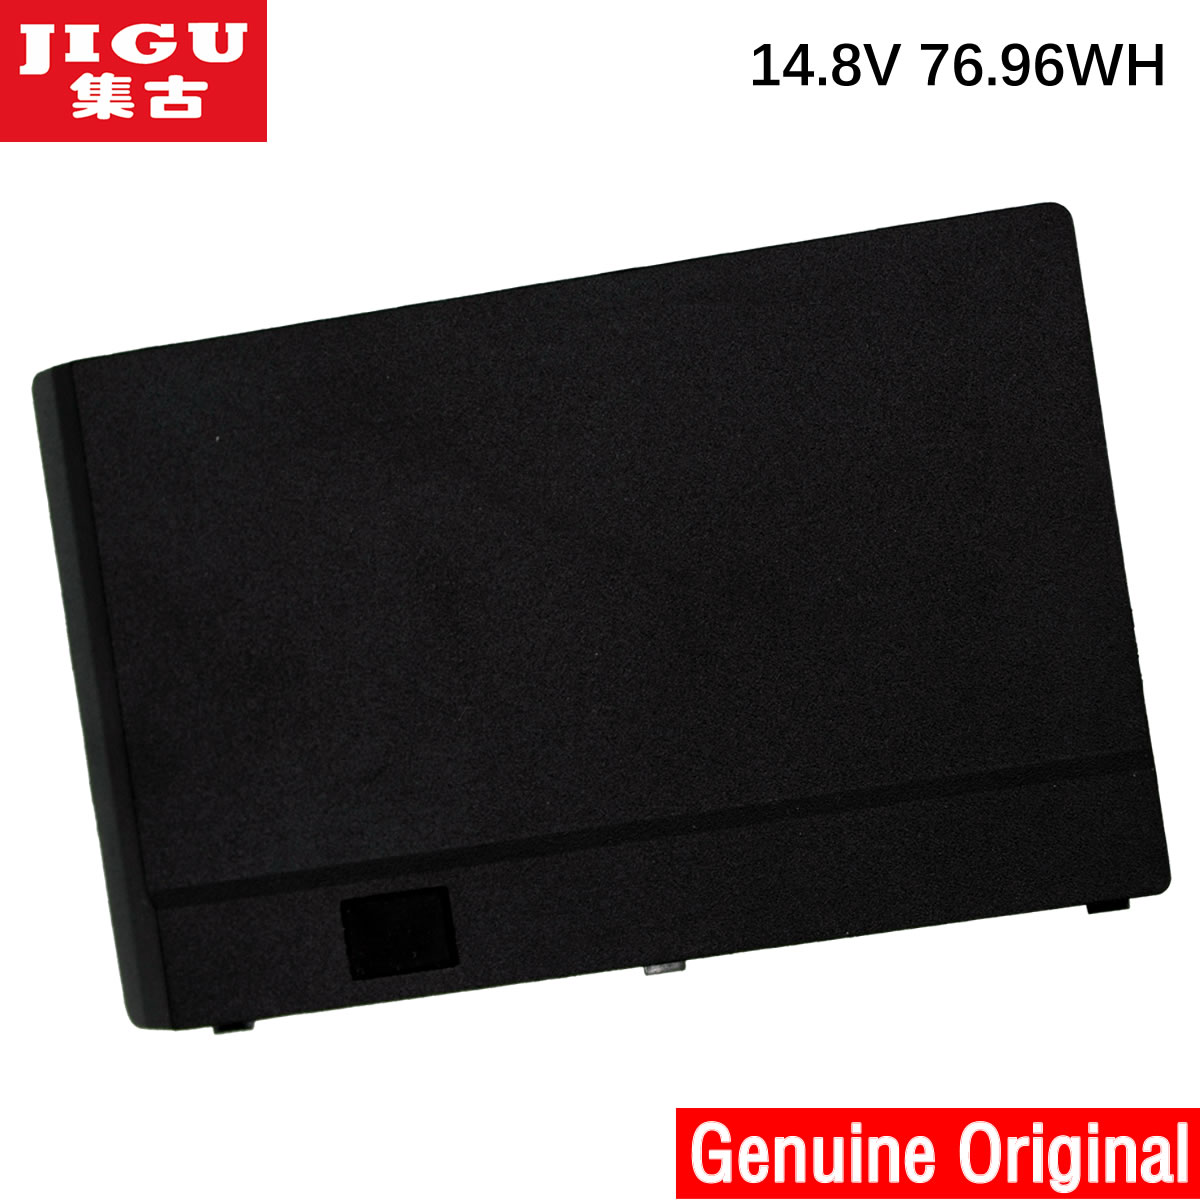 JIGU laptop battery 6-87-W370S-427 6-87-W370S-4271 6-87-W37ES-427 6-87-W37SS-427 W370BAT-3 W370BAT-8 FOR CLEVO K590S K790S original battery for n150bat 6 6 87 n150s 4u91 n150sd laptop battery li ion 11 1v 62wh